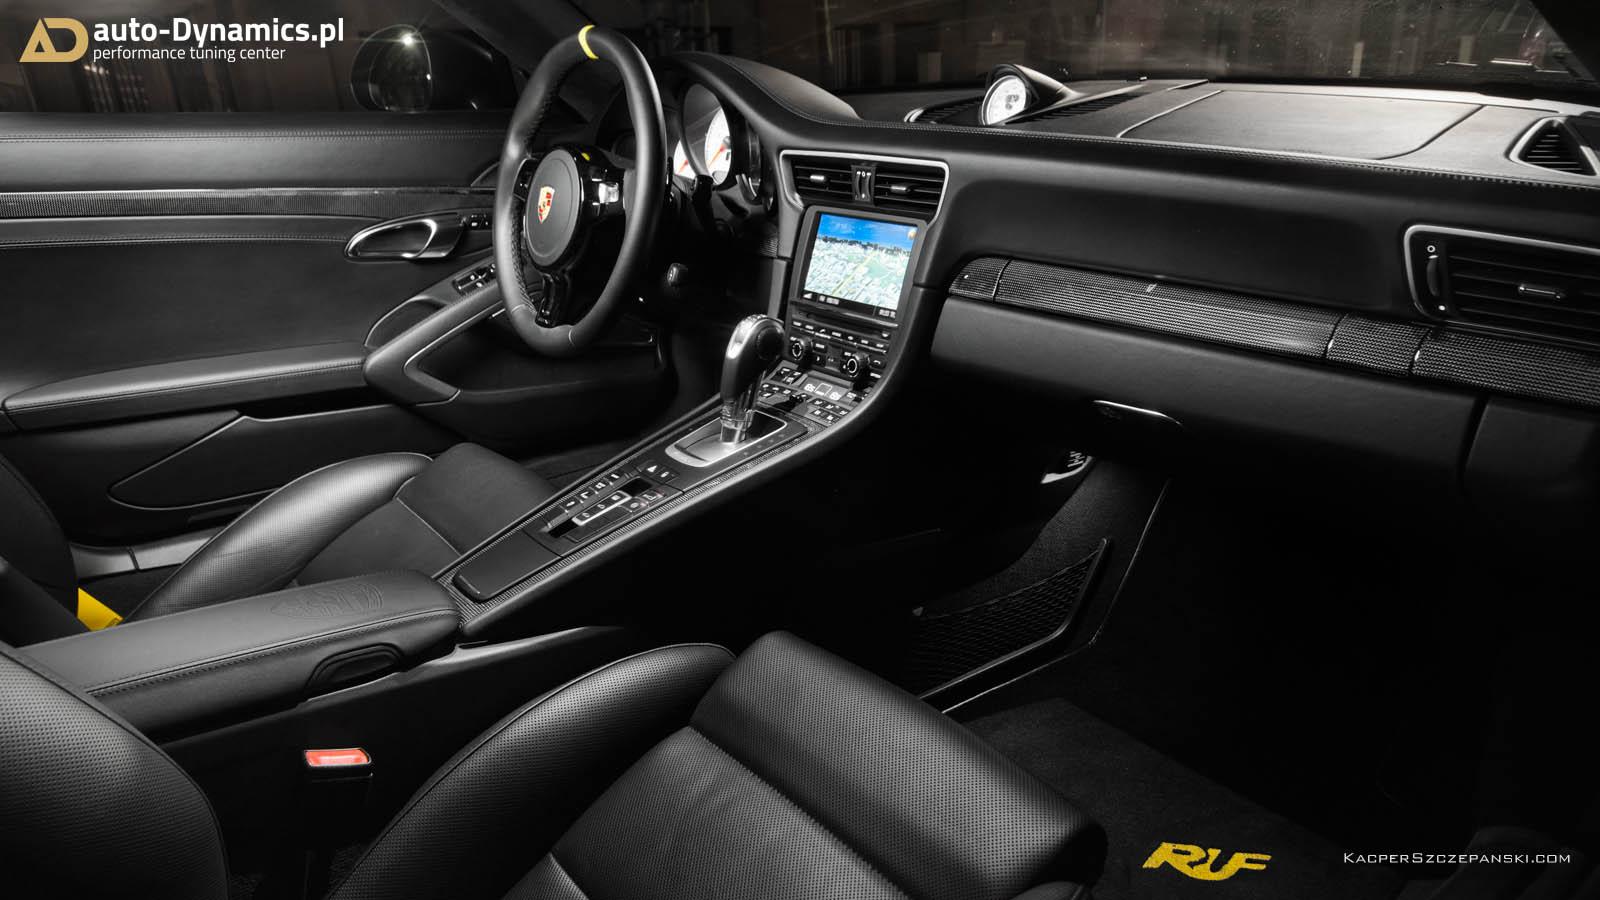 Porsche 911 Turbo S by Auto-Dynamics (5)